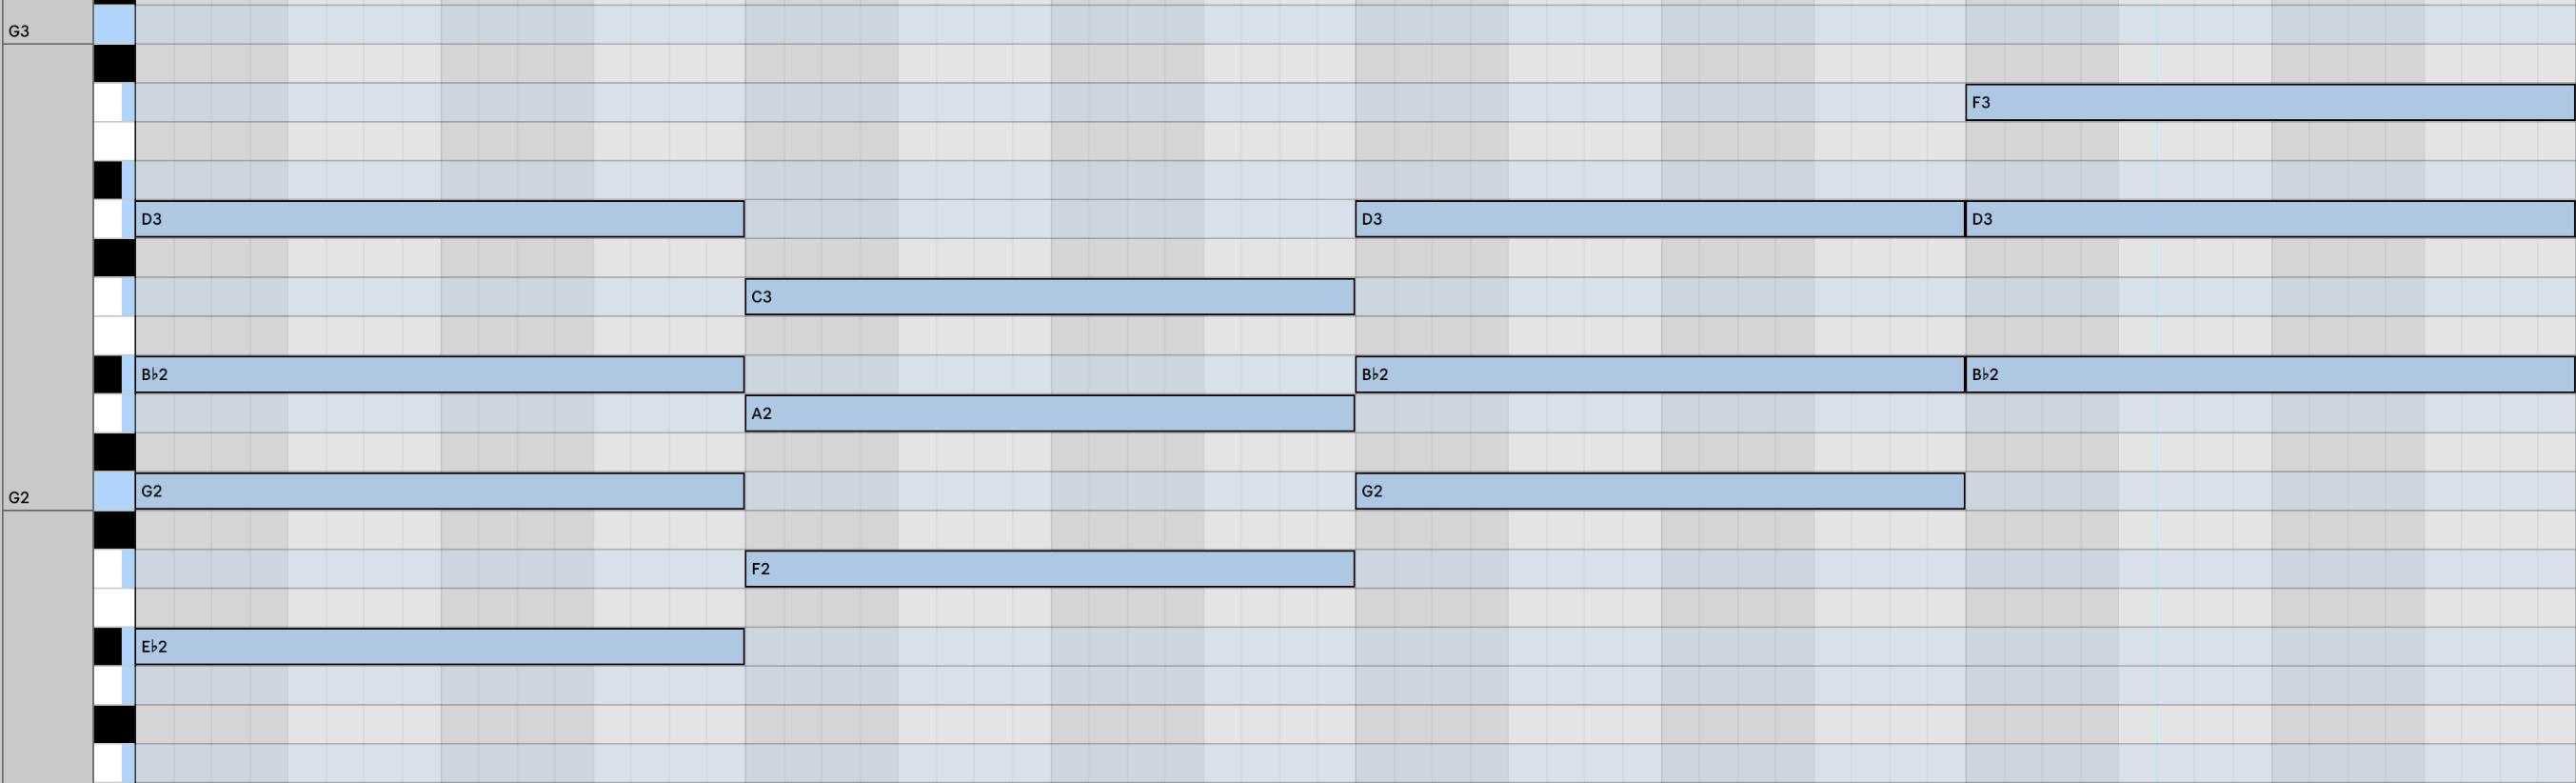 chord progression (VI7 VII i III)